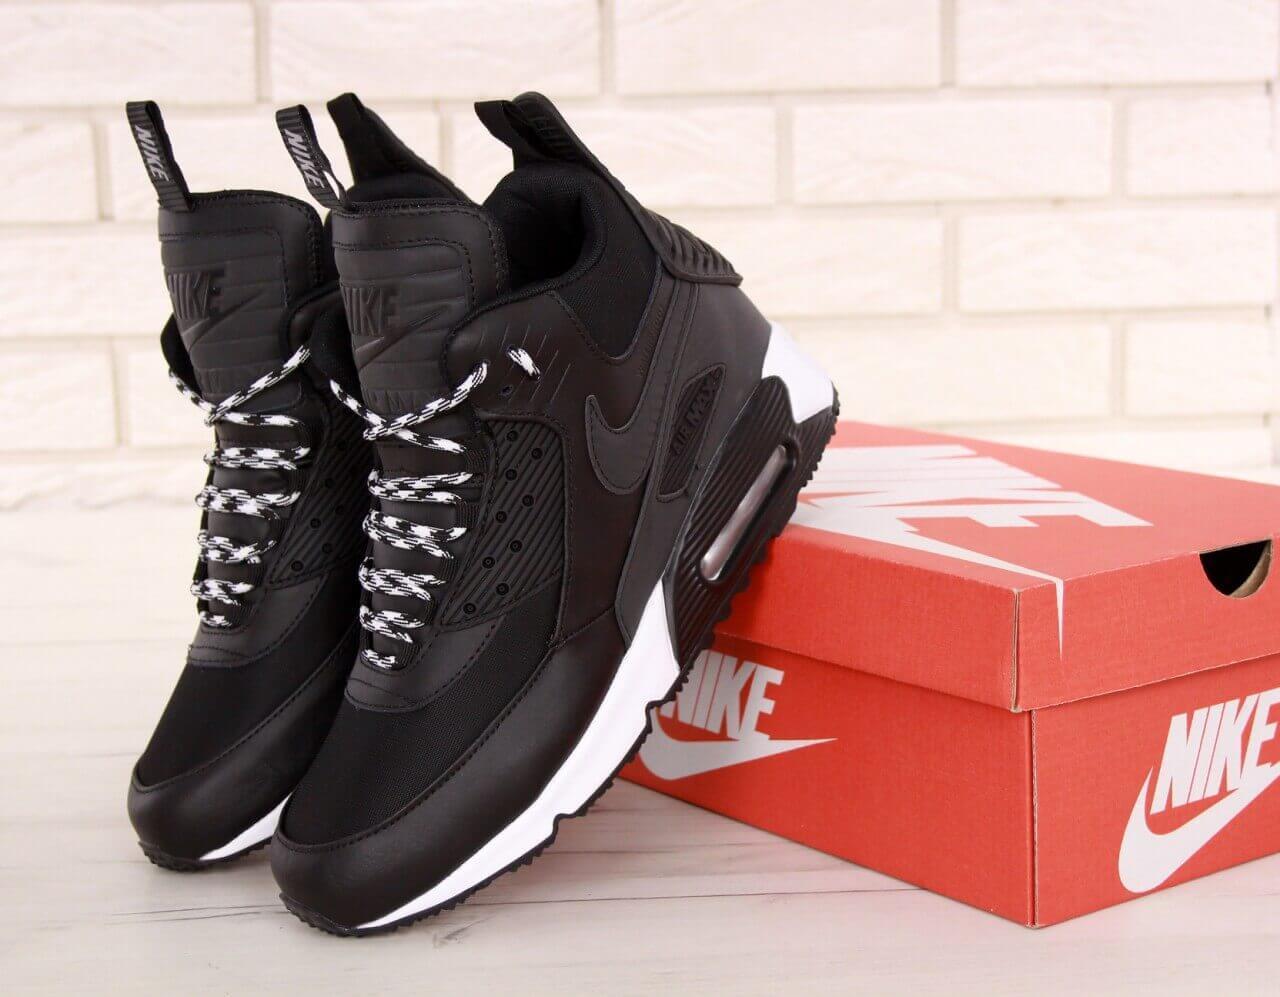 Мужские зимние термо кроссовки Air Max 90 Sneakerboot Winter Black